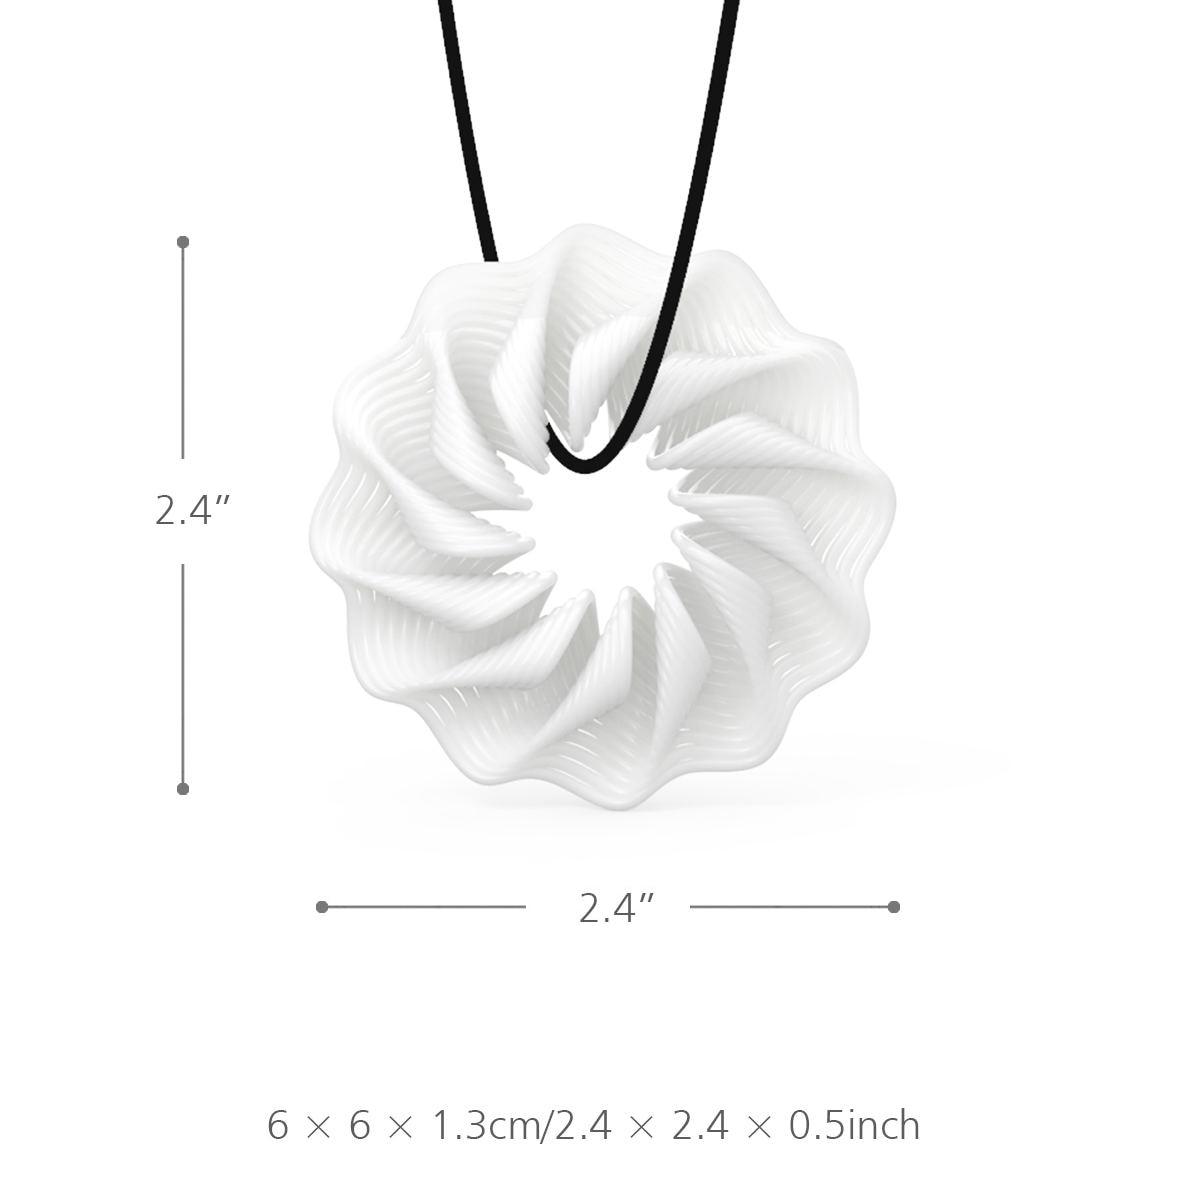 Tooarts Tomfeel 3D drukāto rotaslietu ritms Elegants modeļa kulonu - Mājas dekors - Foto 4